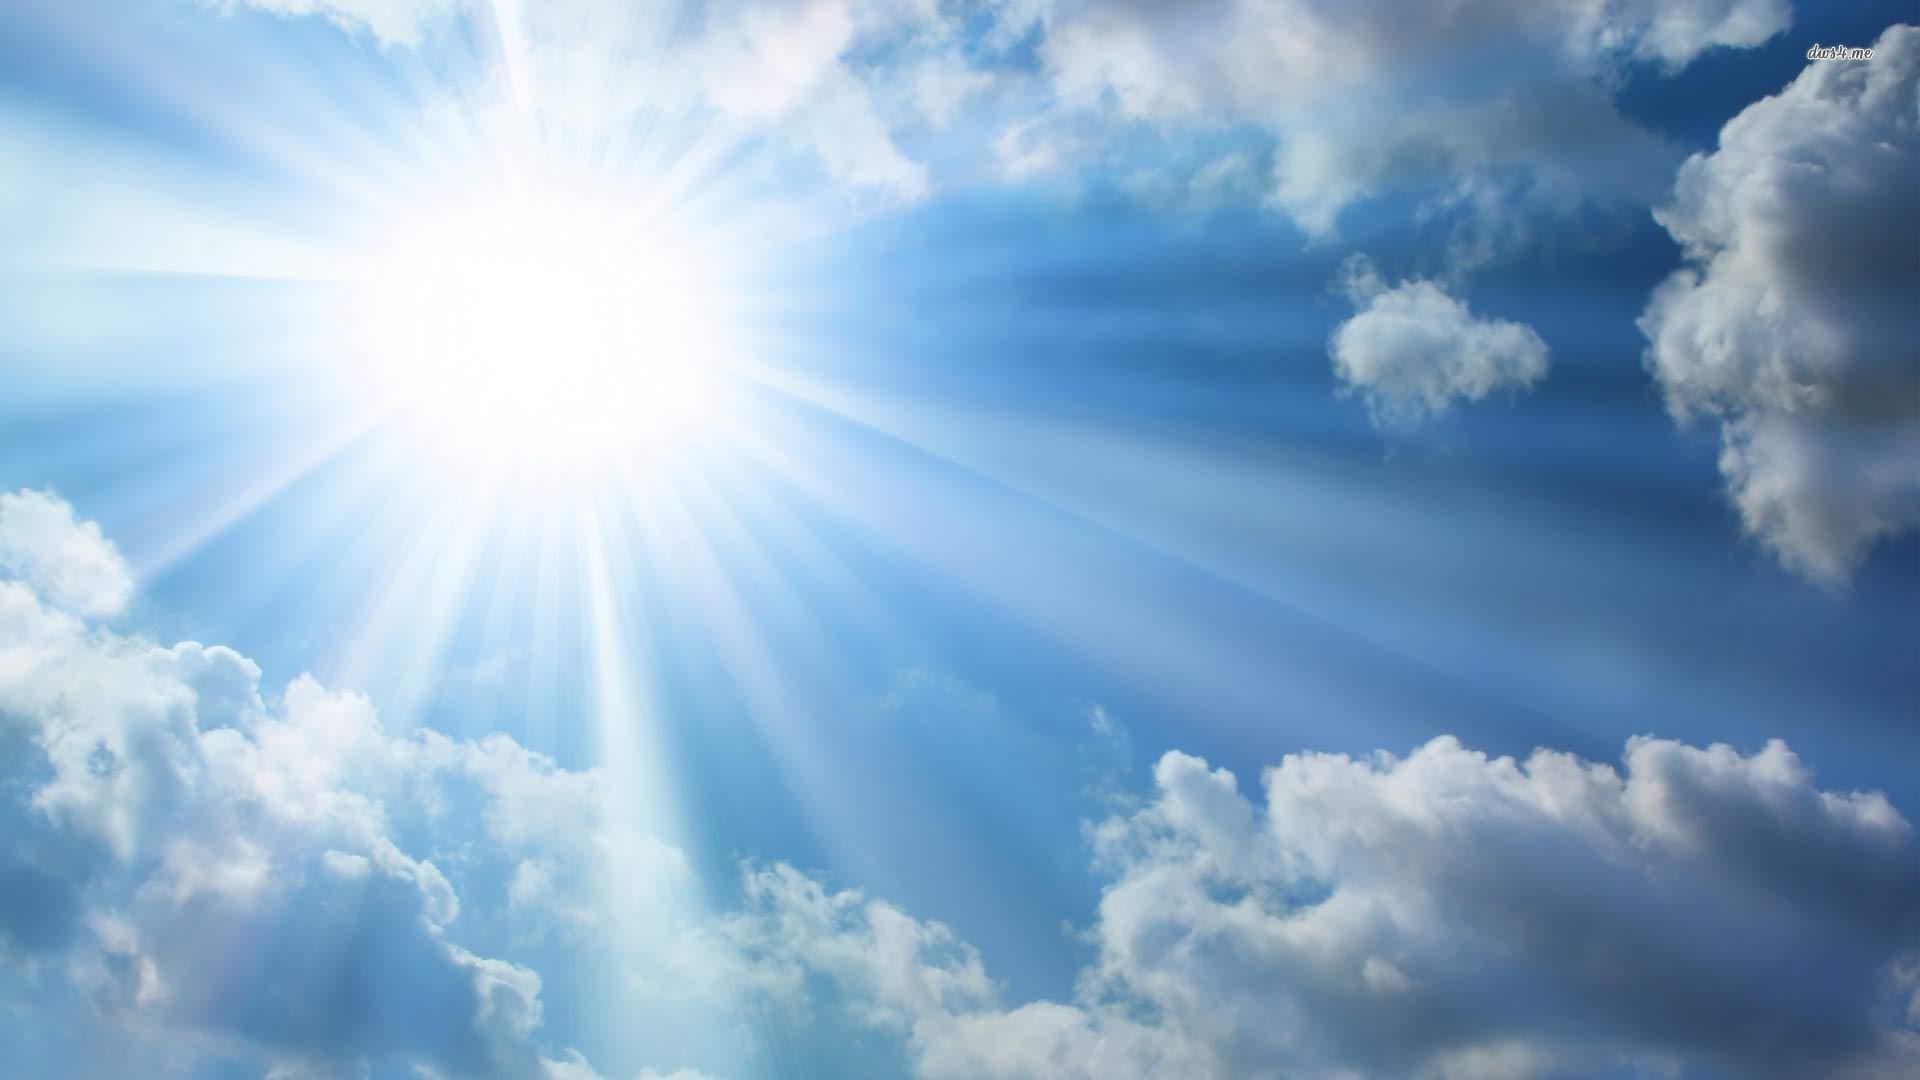 Widescreen Sunshine